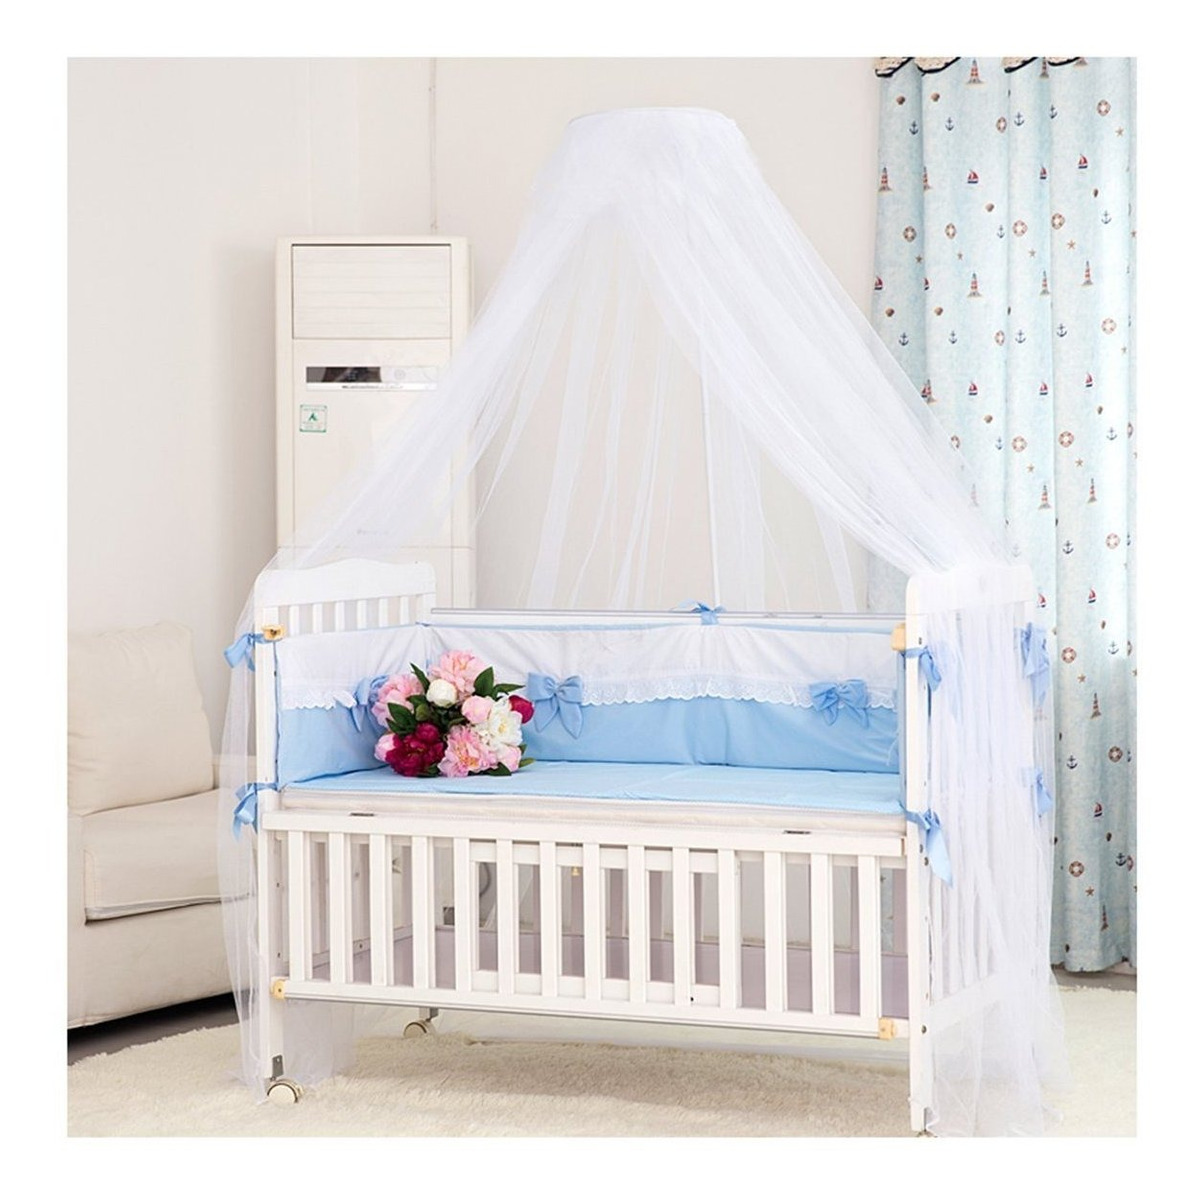 Cama Infantil Dosel Para Cuna Con Mosquitero Mosquito Net